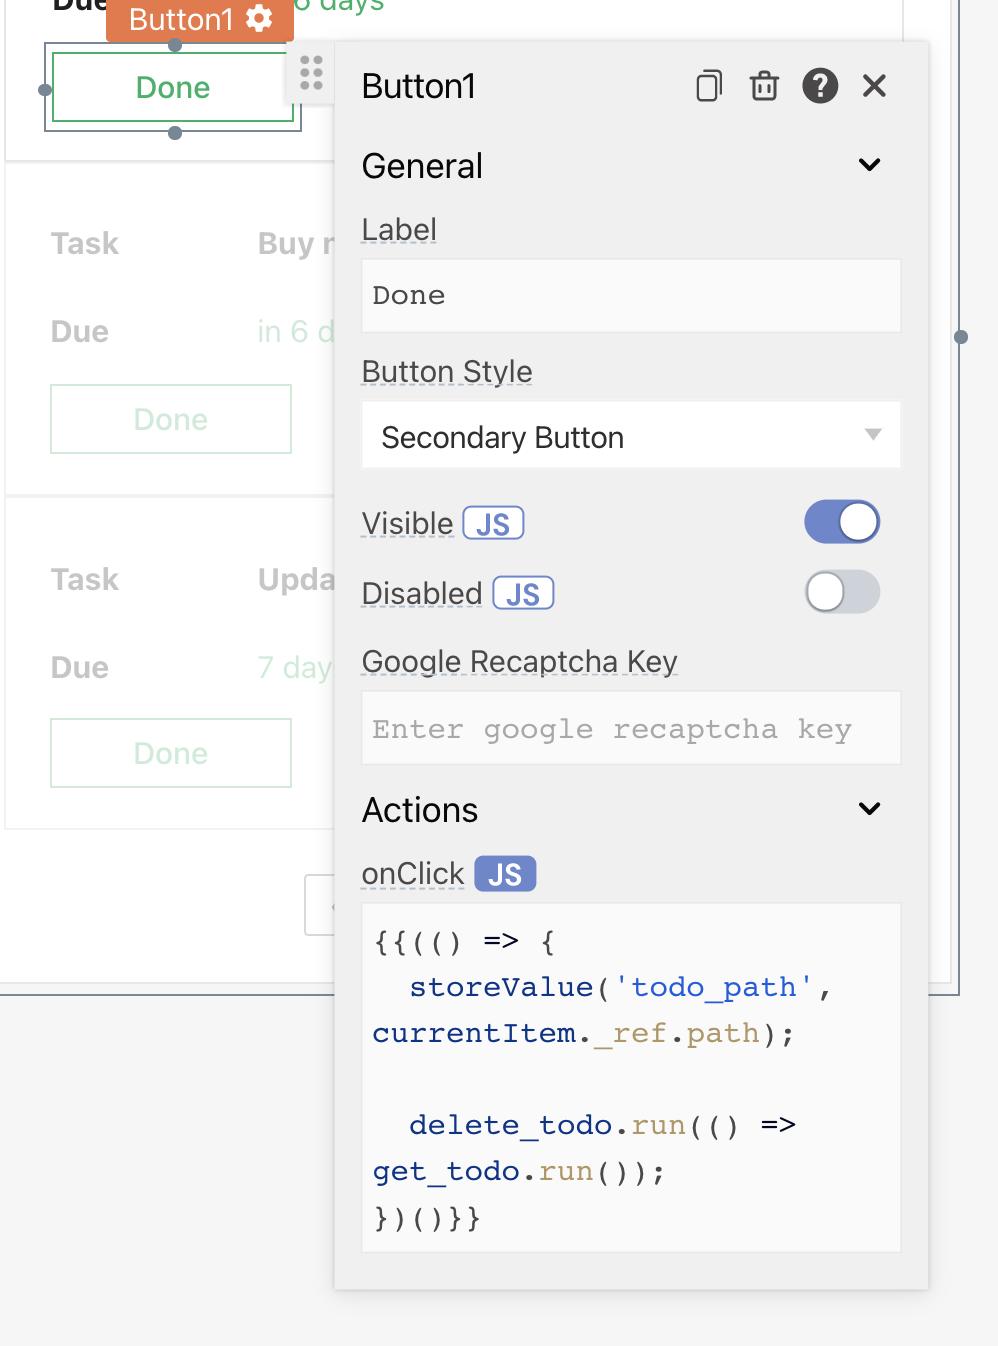 image showing delete todo button configuration